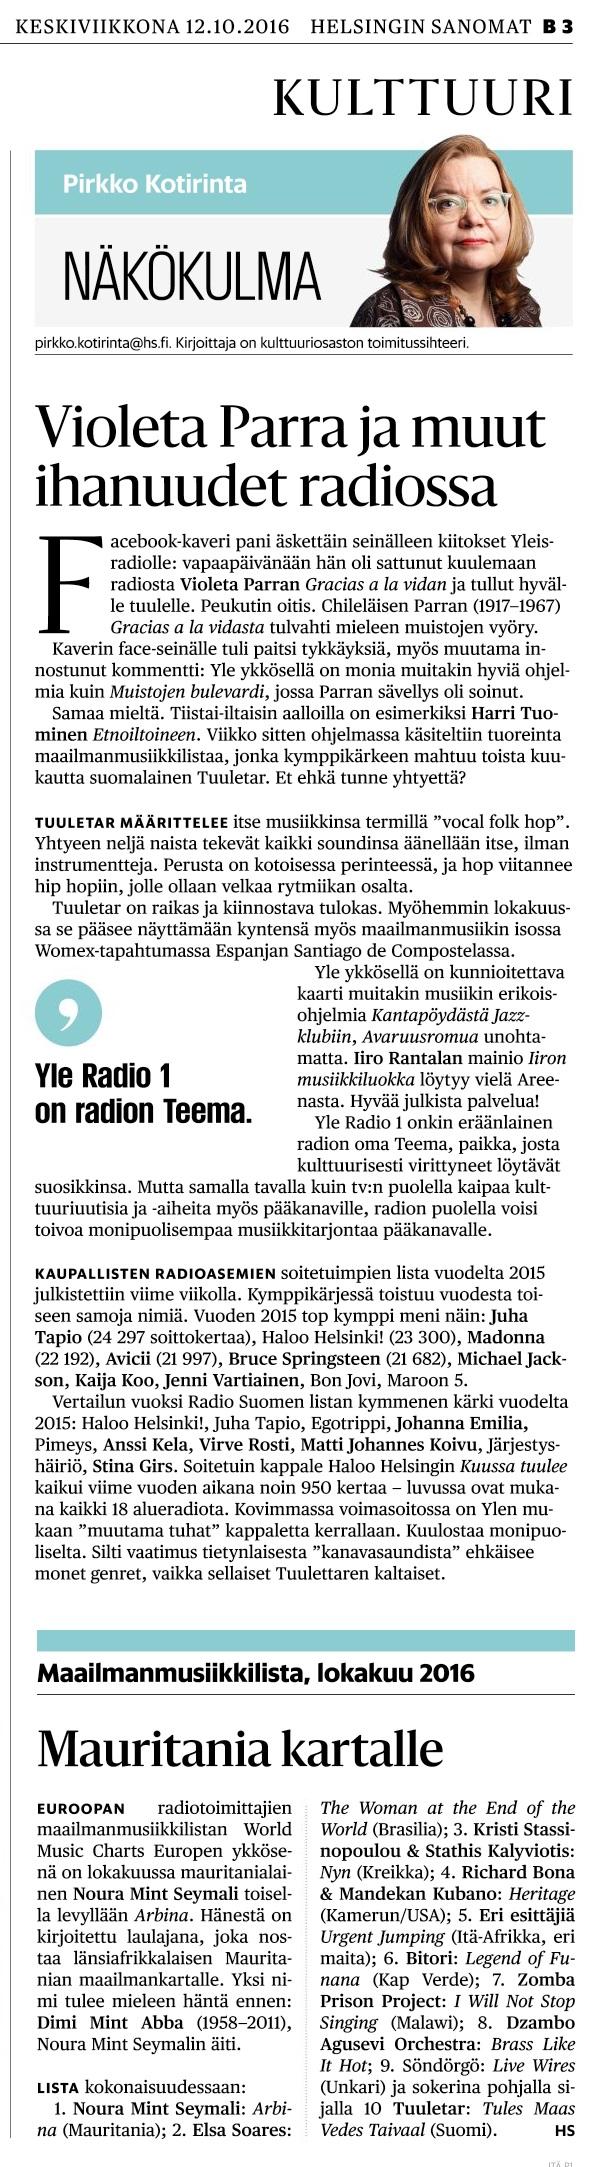 Helsingin Sanomat, 12.10.2016